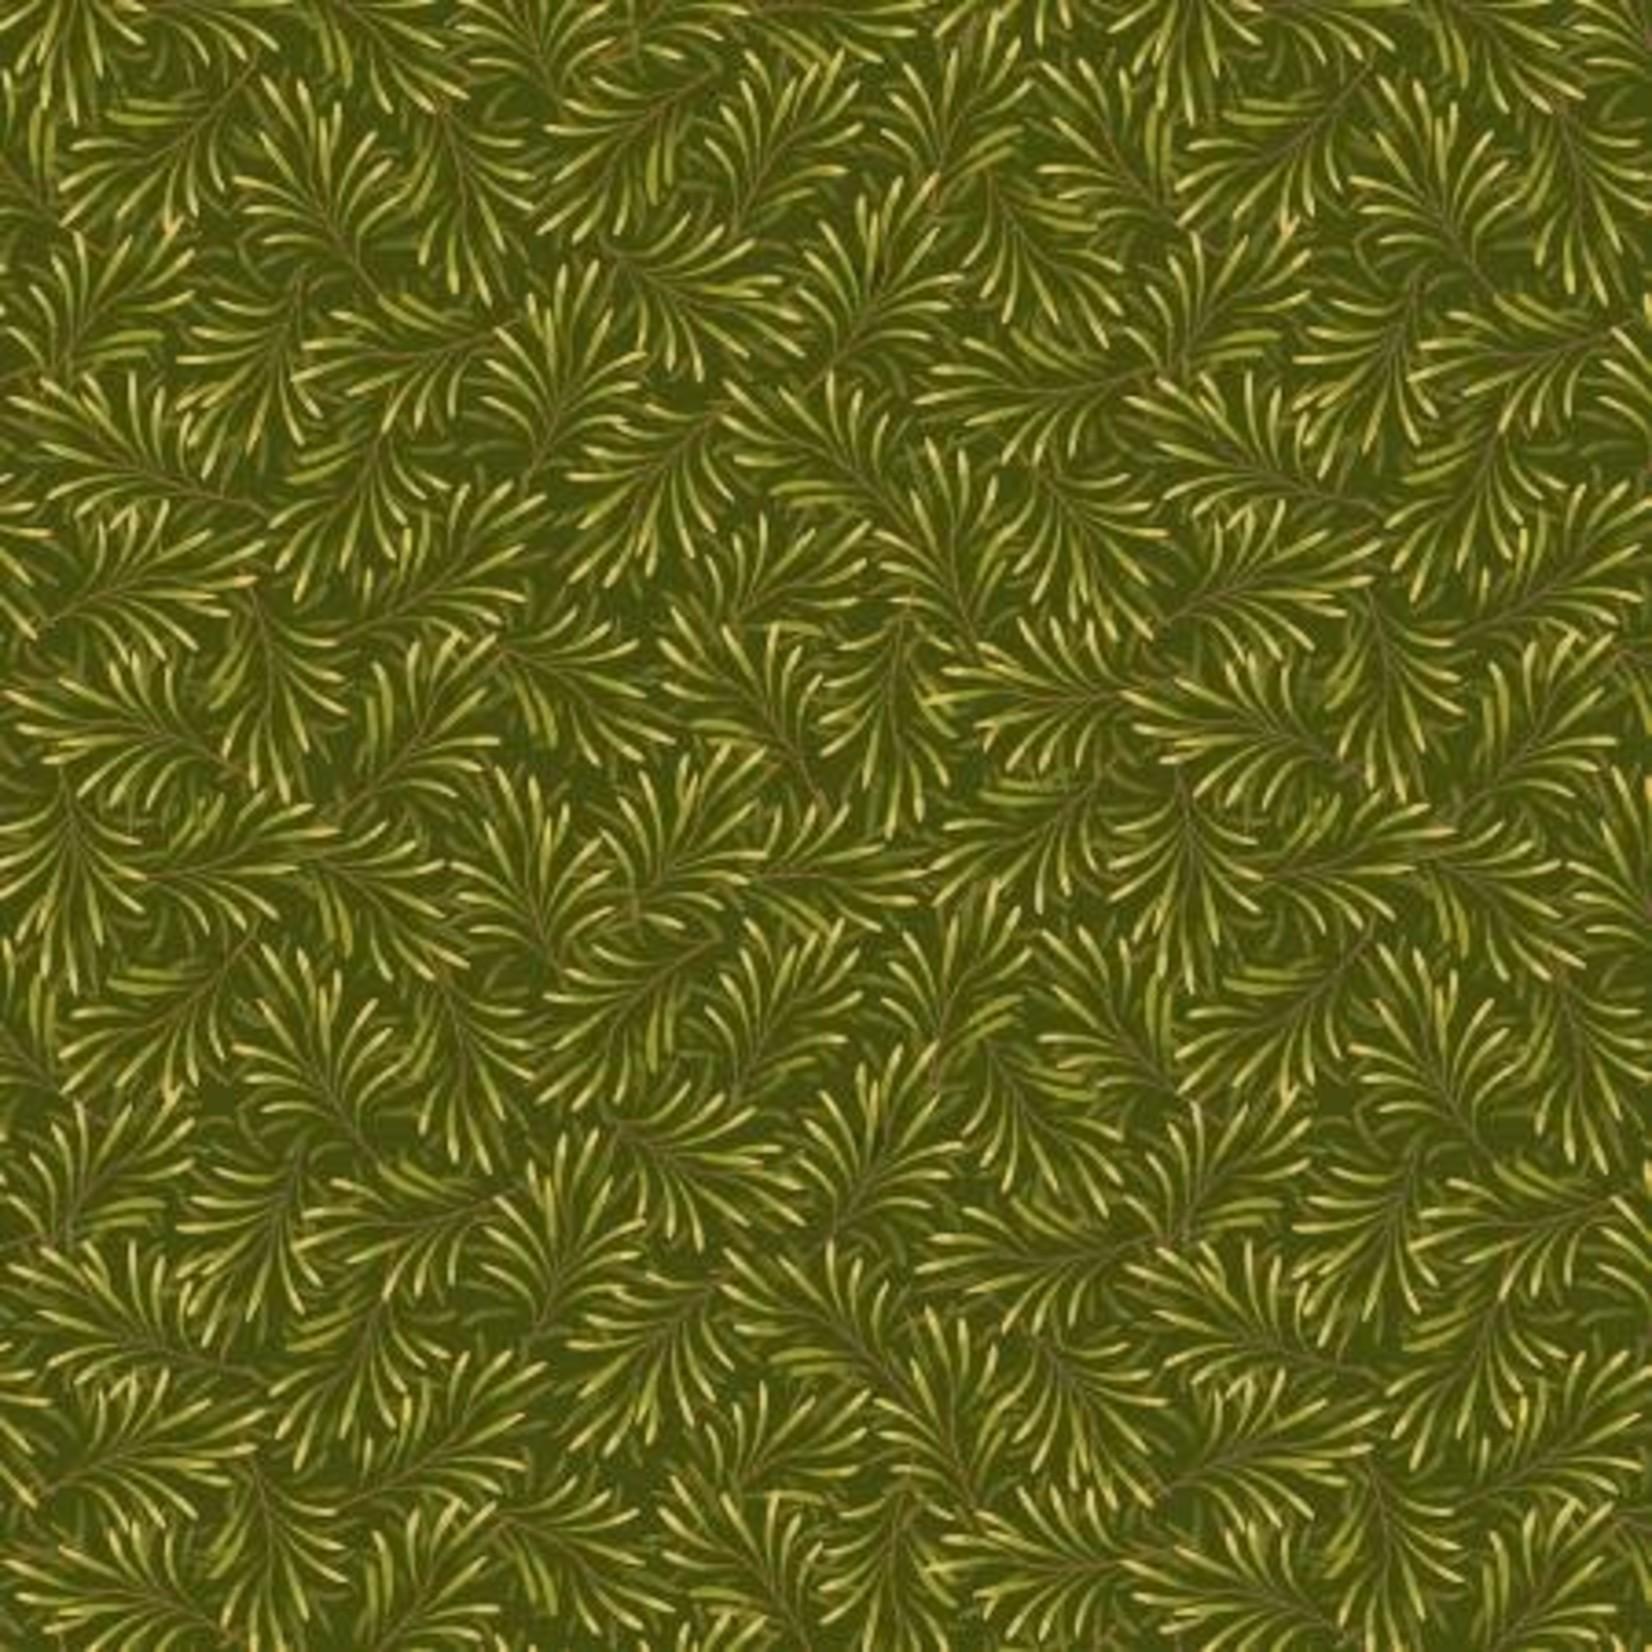 Benartex Studio Boughs of Beauty - Medium Green